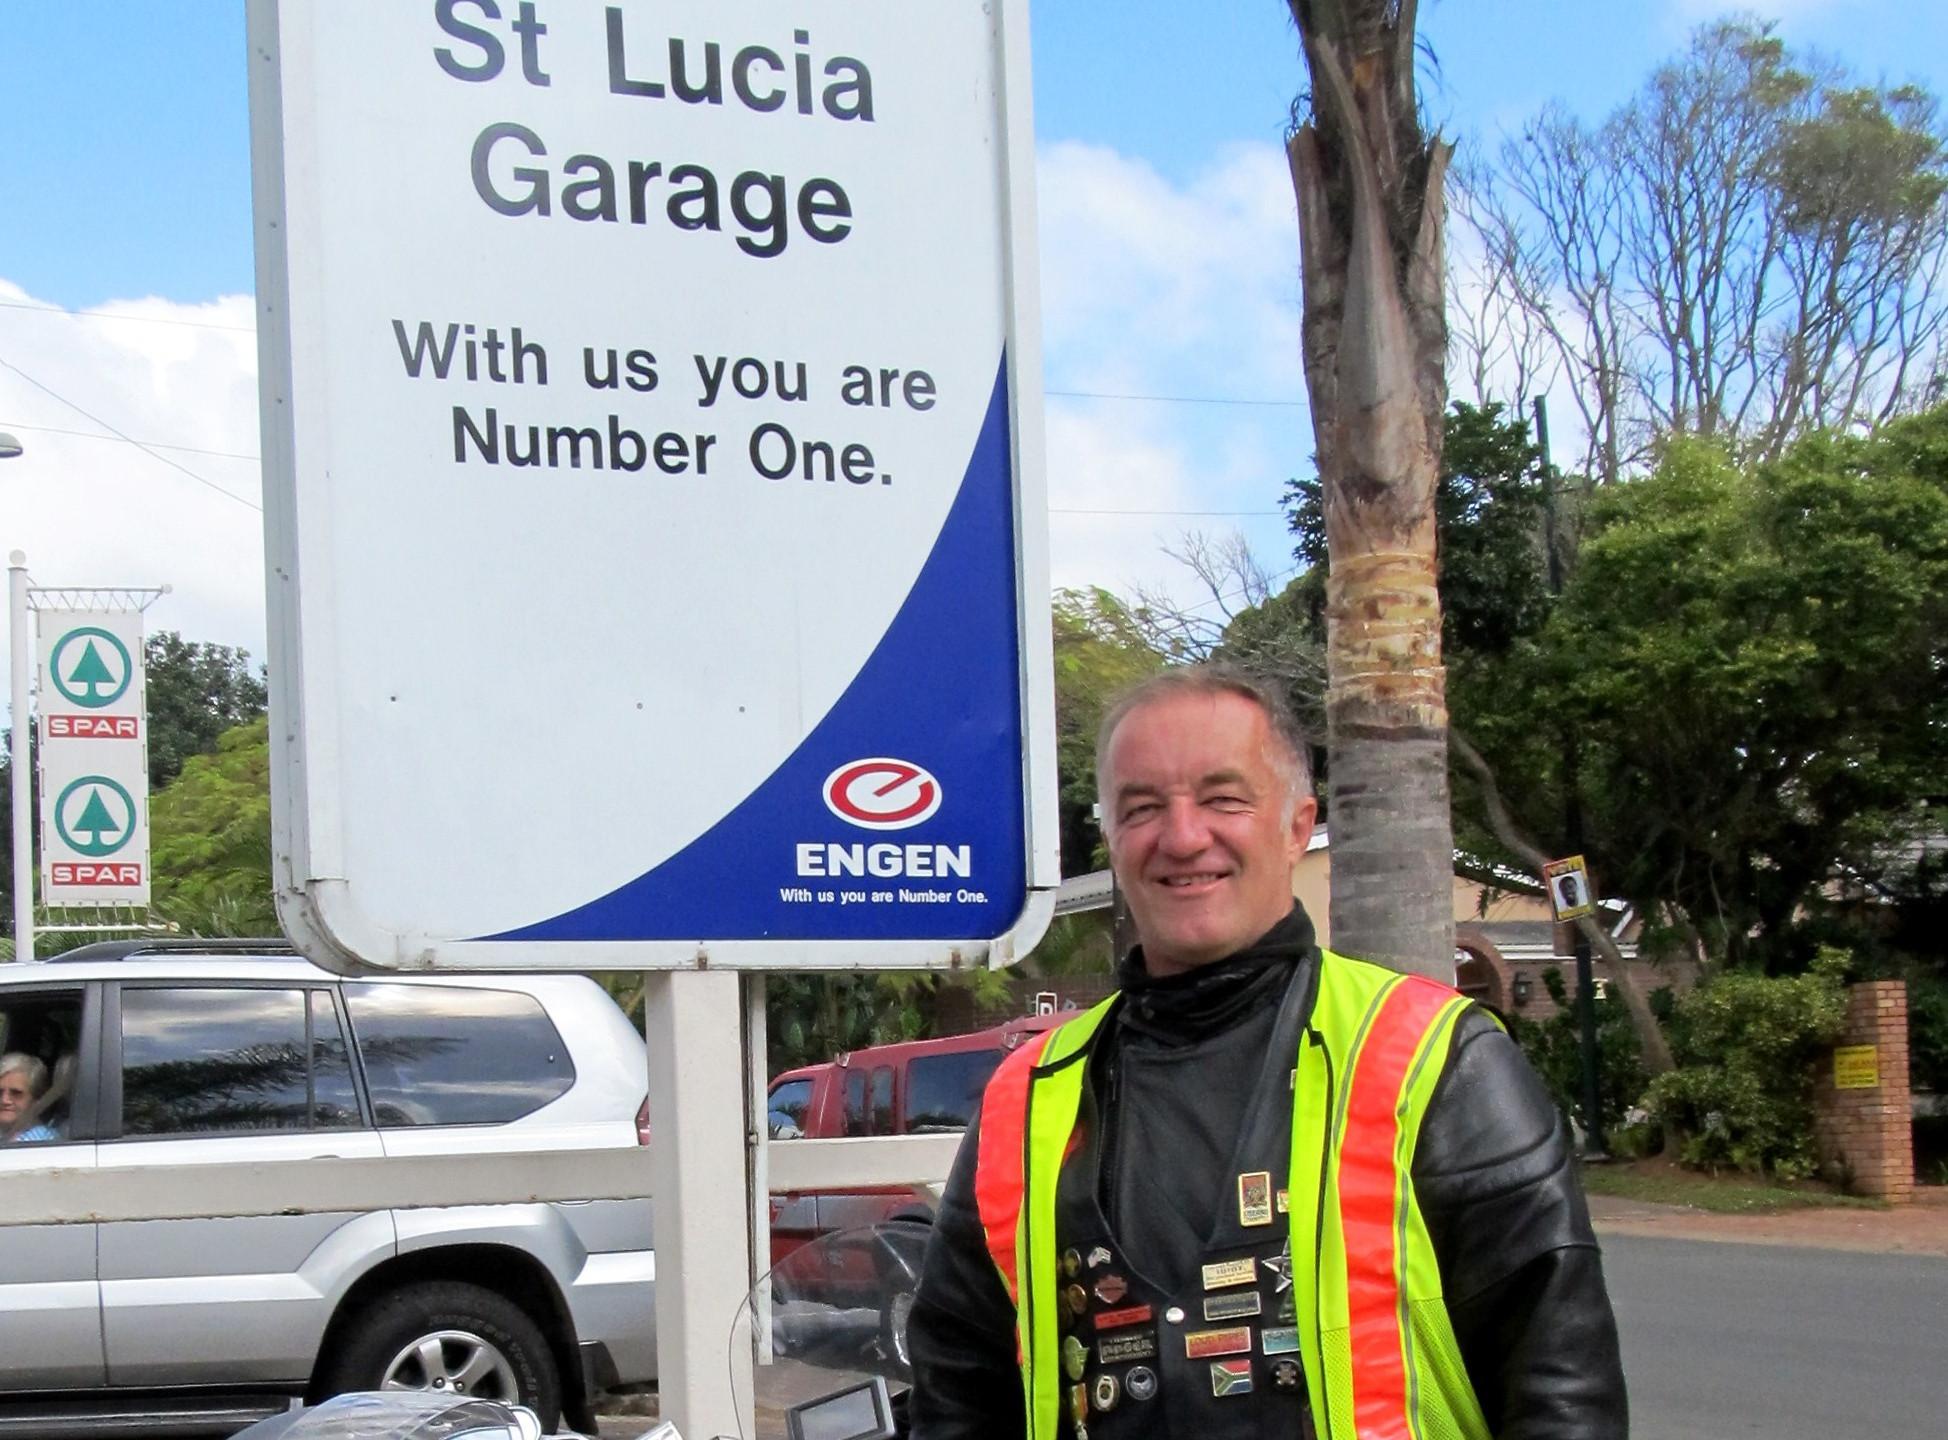 St Lucia - Douglas Defty